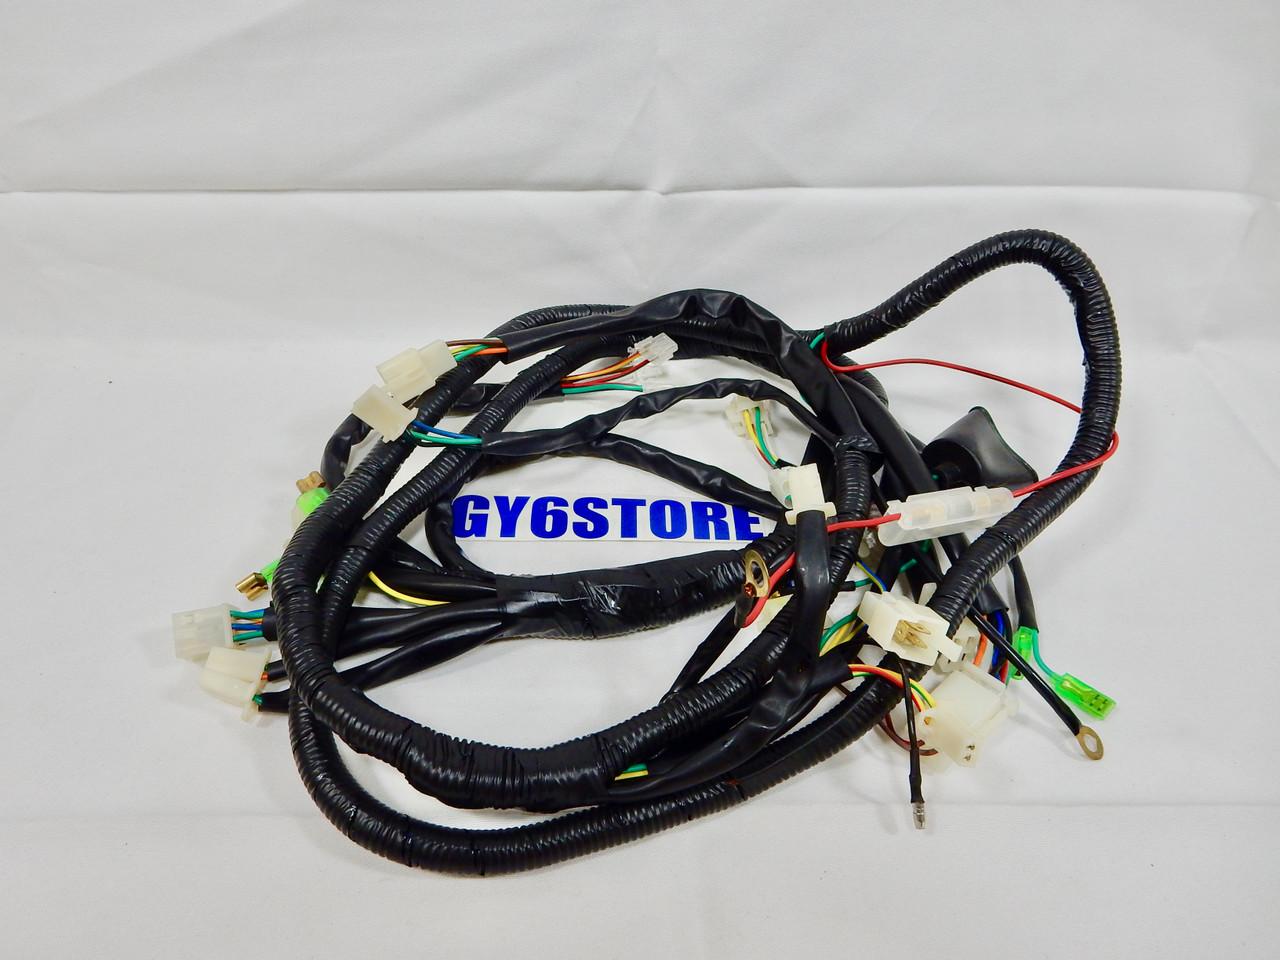 taotao lancer 150cc evo 50cc scooter complete wiring harness oem [ 1280 x 960 Pixel ]